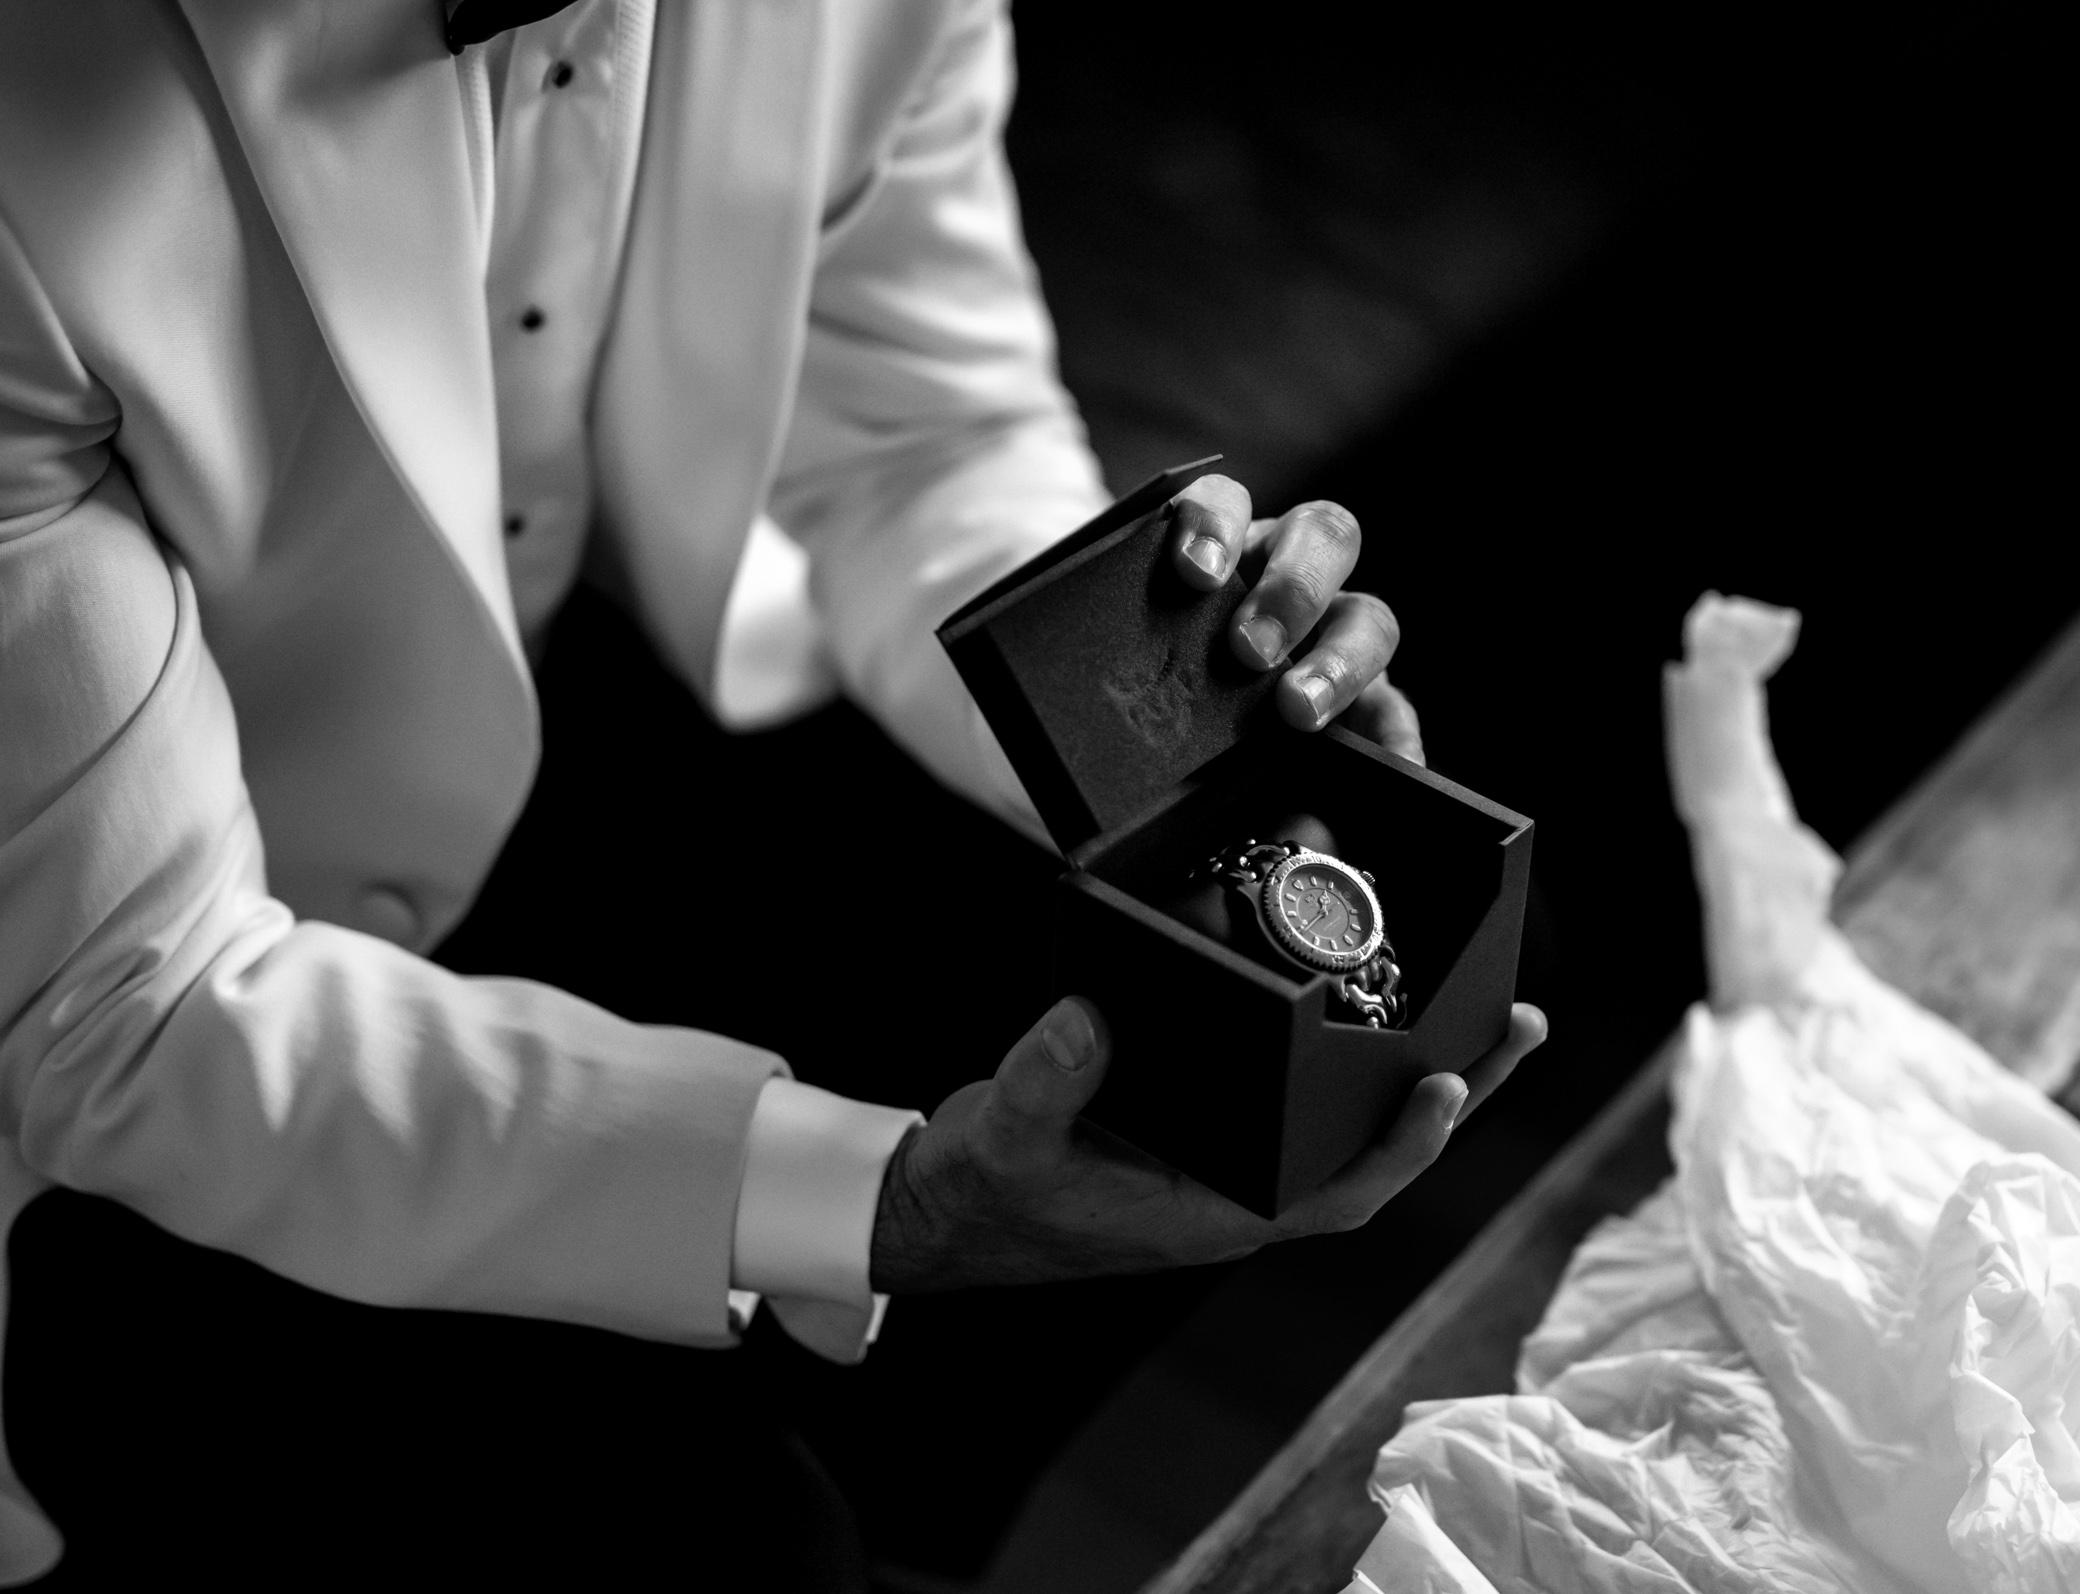 mr-theodore_white-vine-photography_same-sex-wedding-directory9.jpg